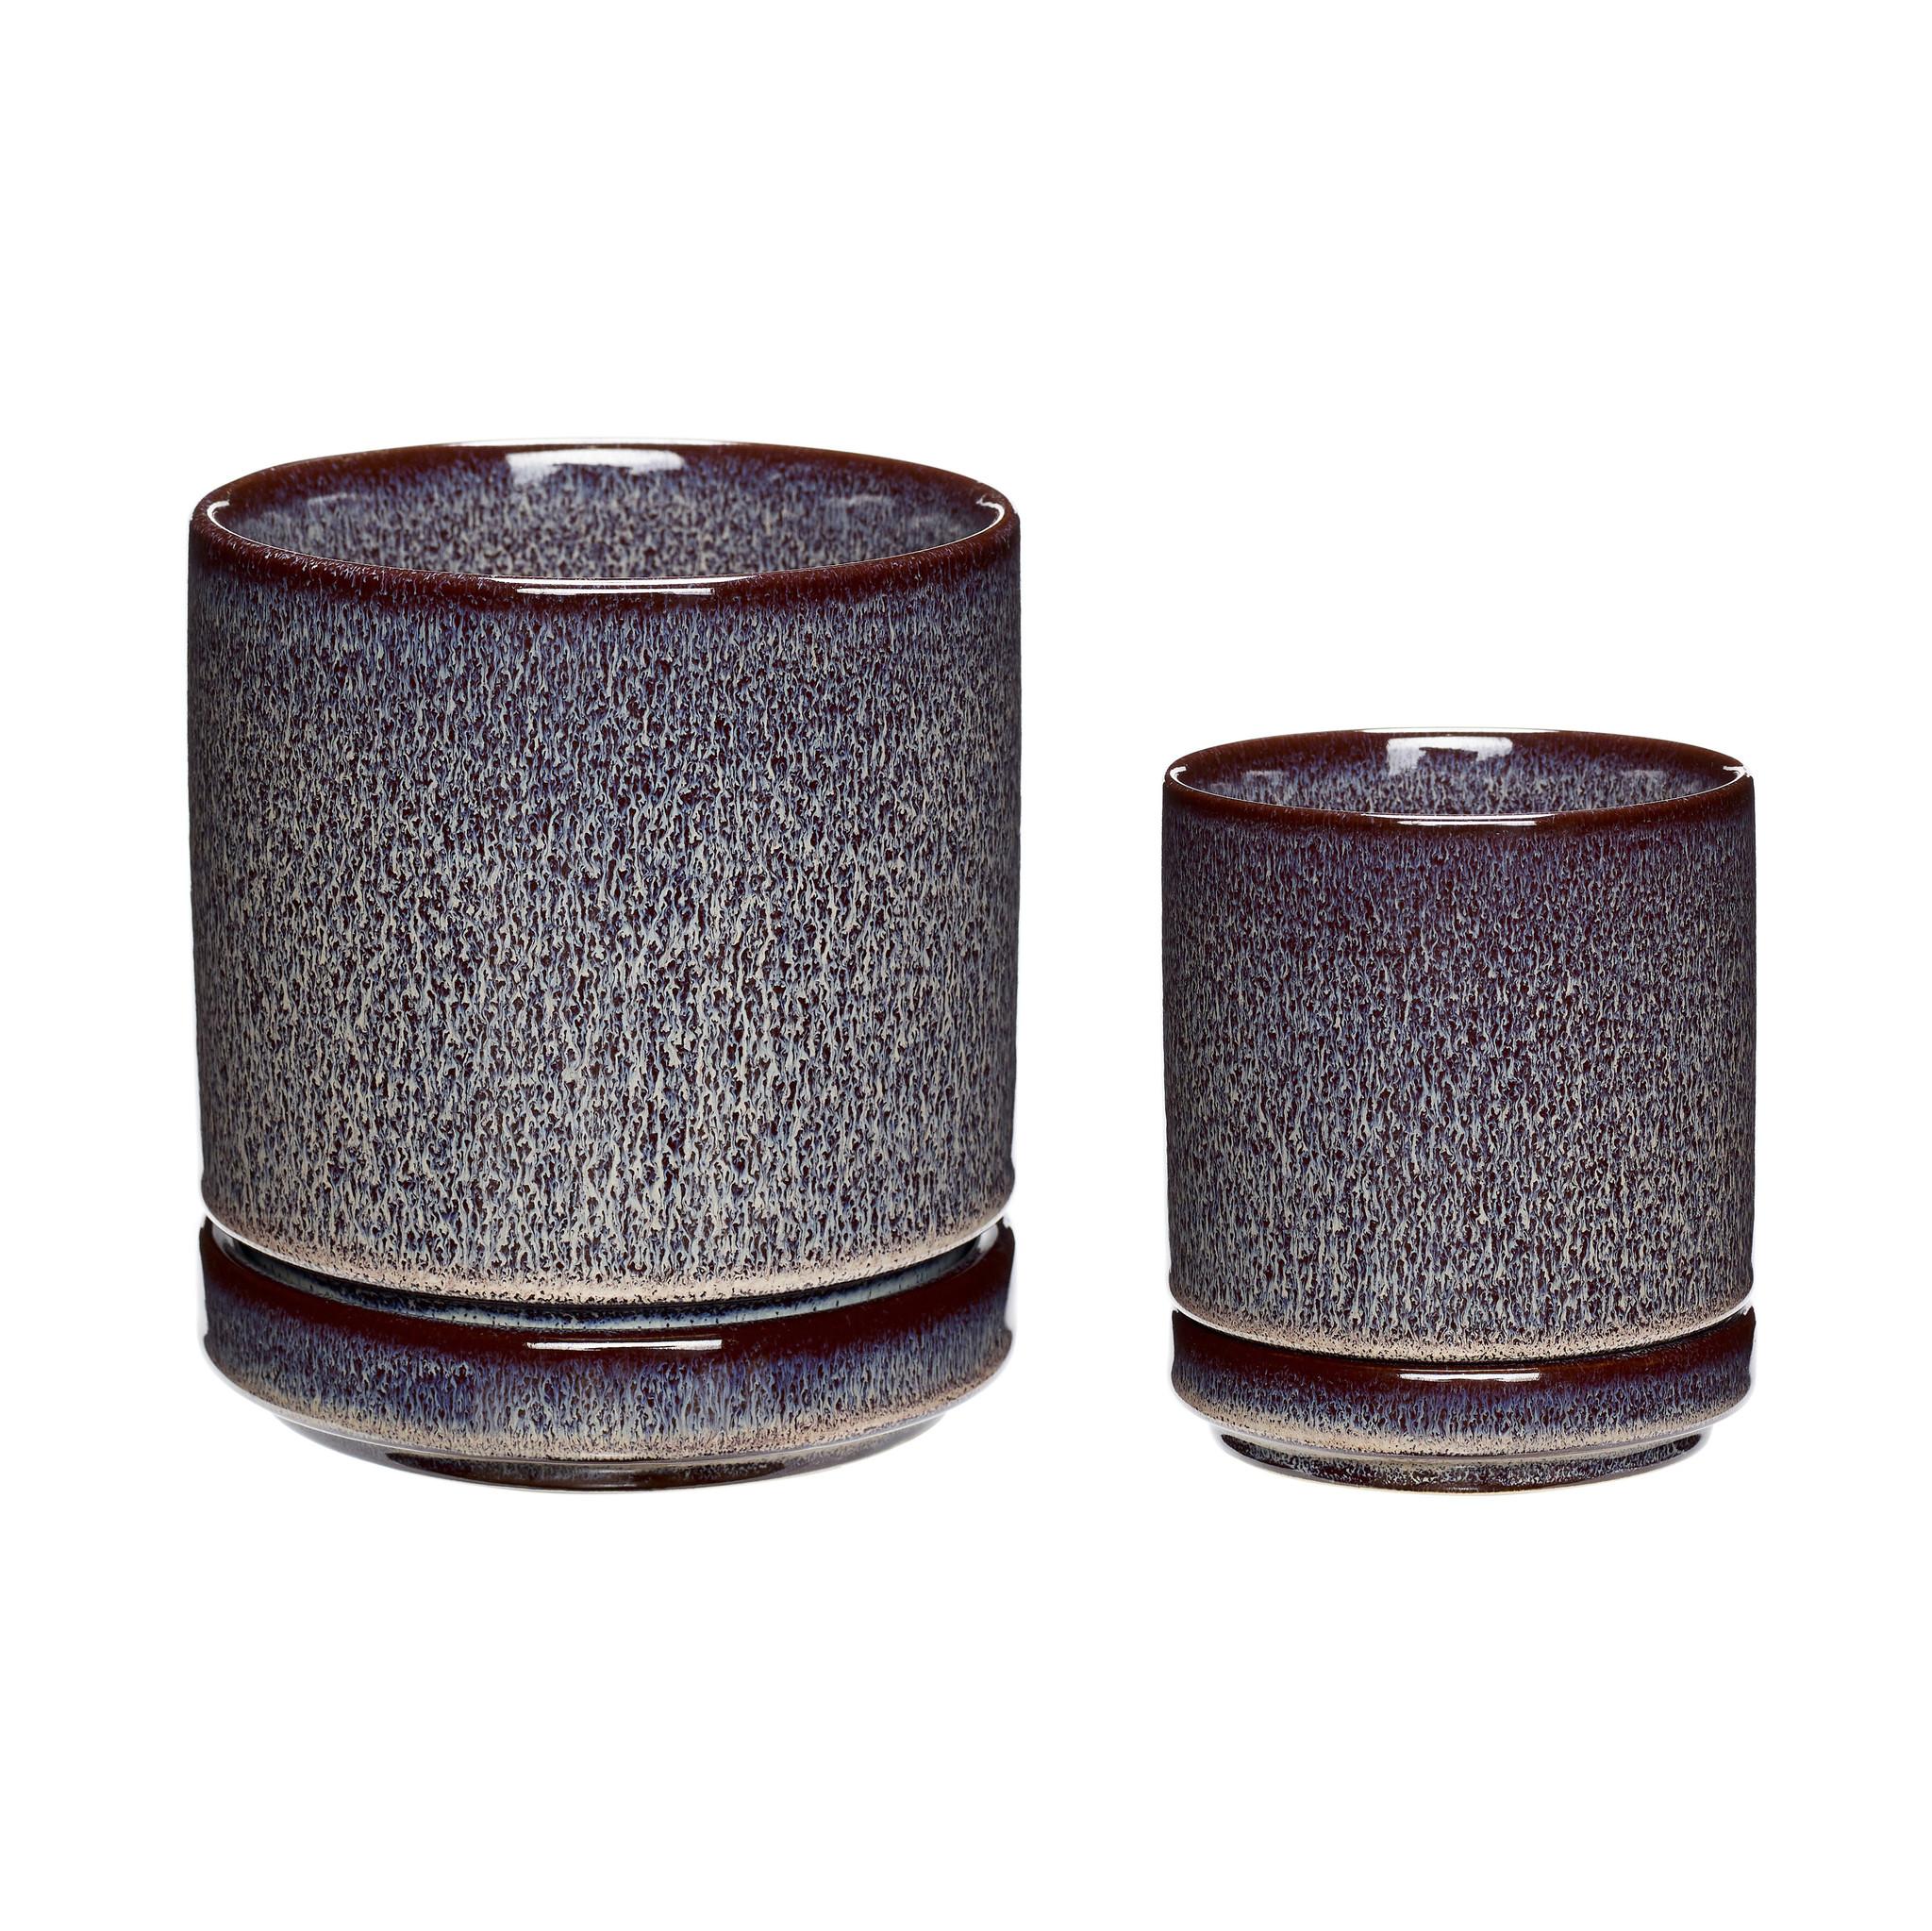 Hubsch Pot, keramiek, pruim, set van 2